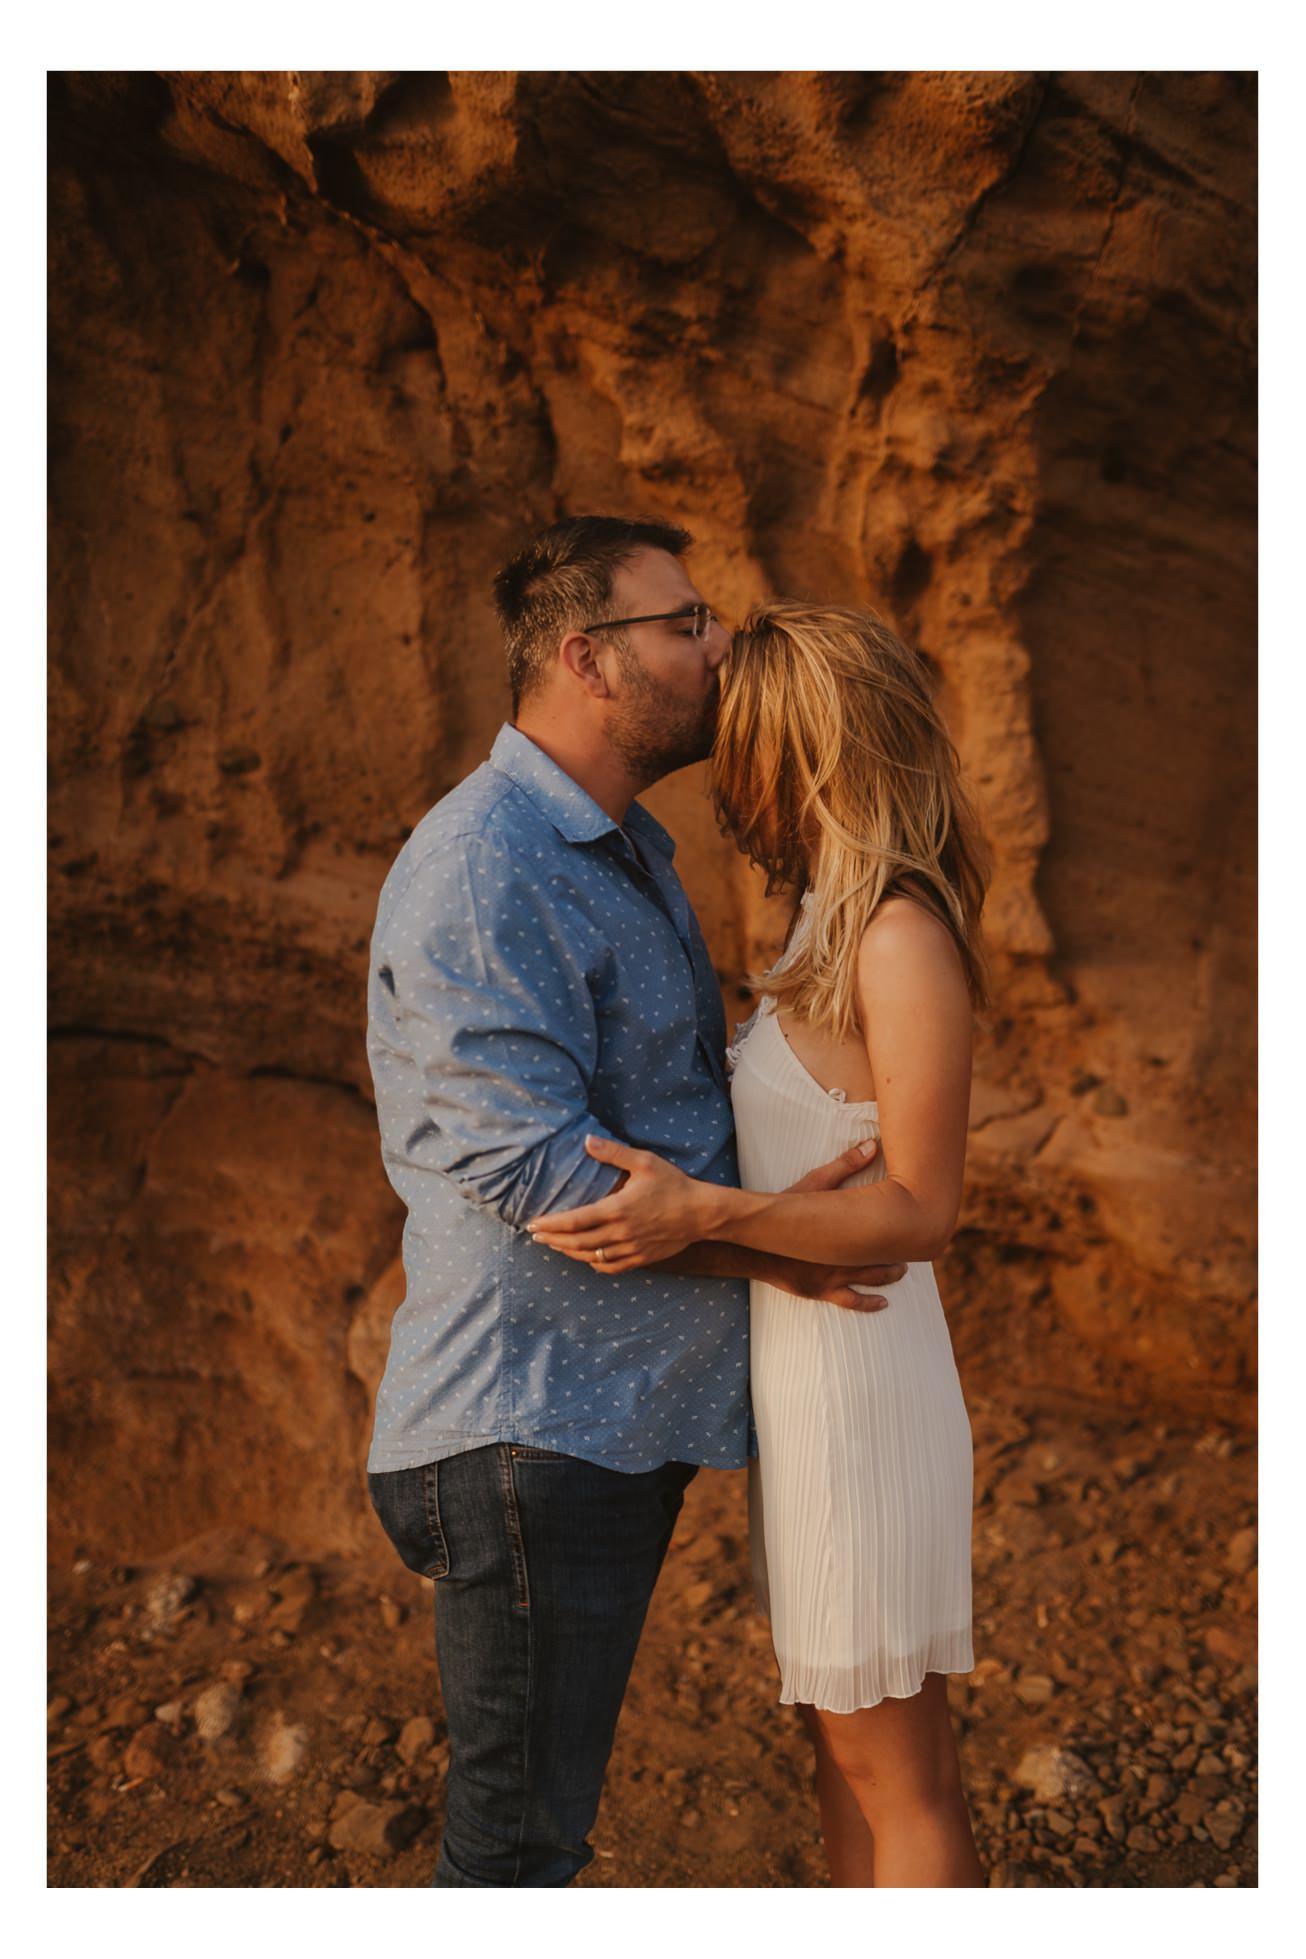 Gran Canaria Canary Islands Wedding Photographer 25